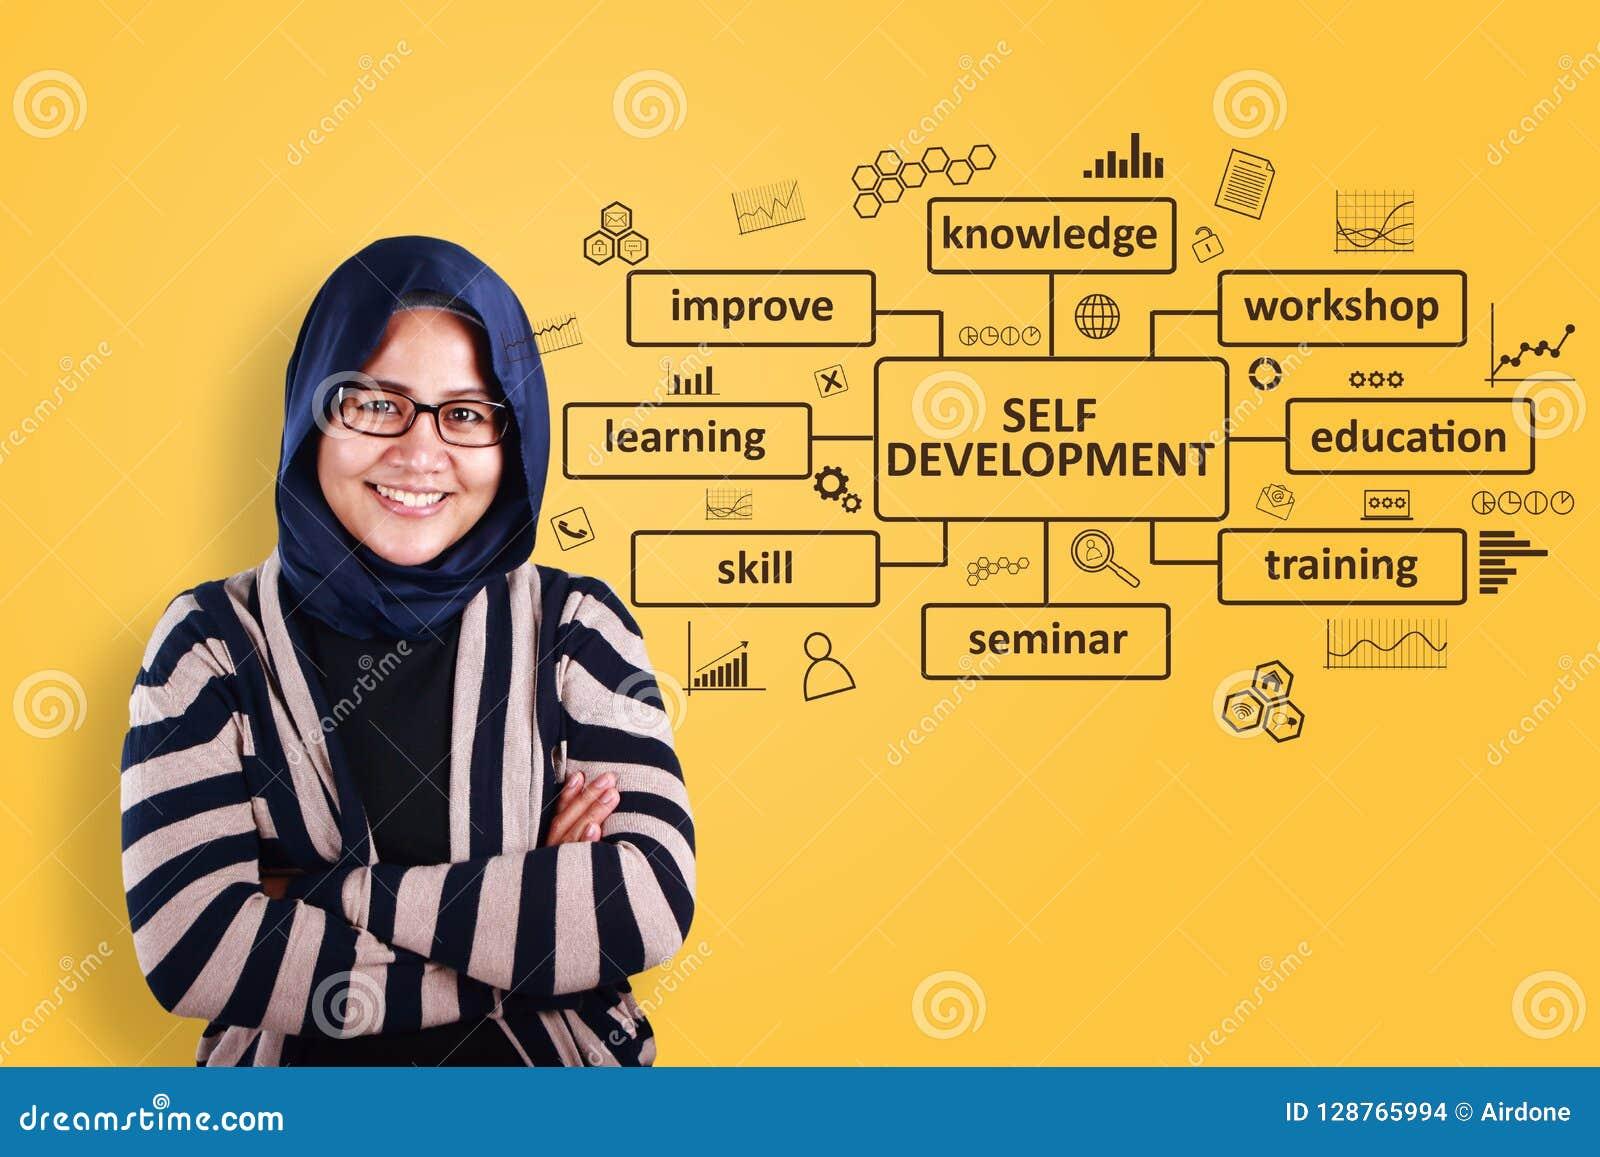 Self Development, Motivational Words Quotes Concept Stock Photo